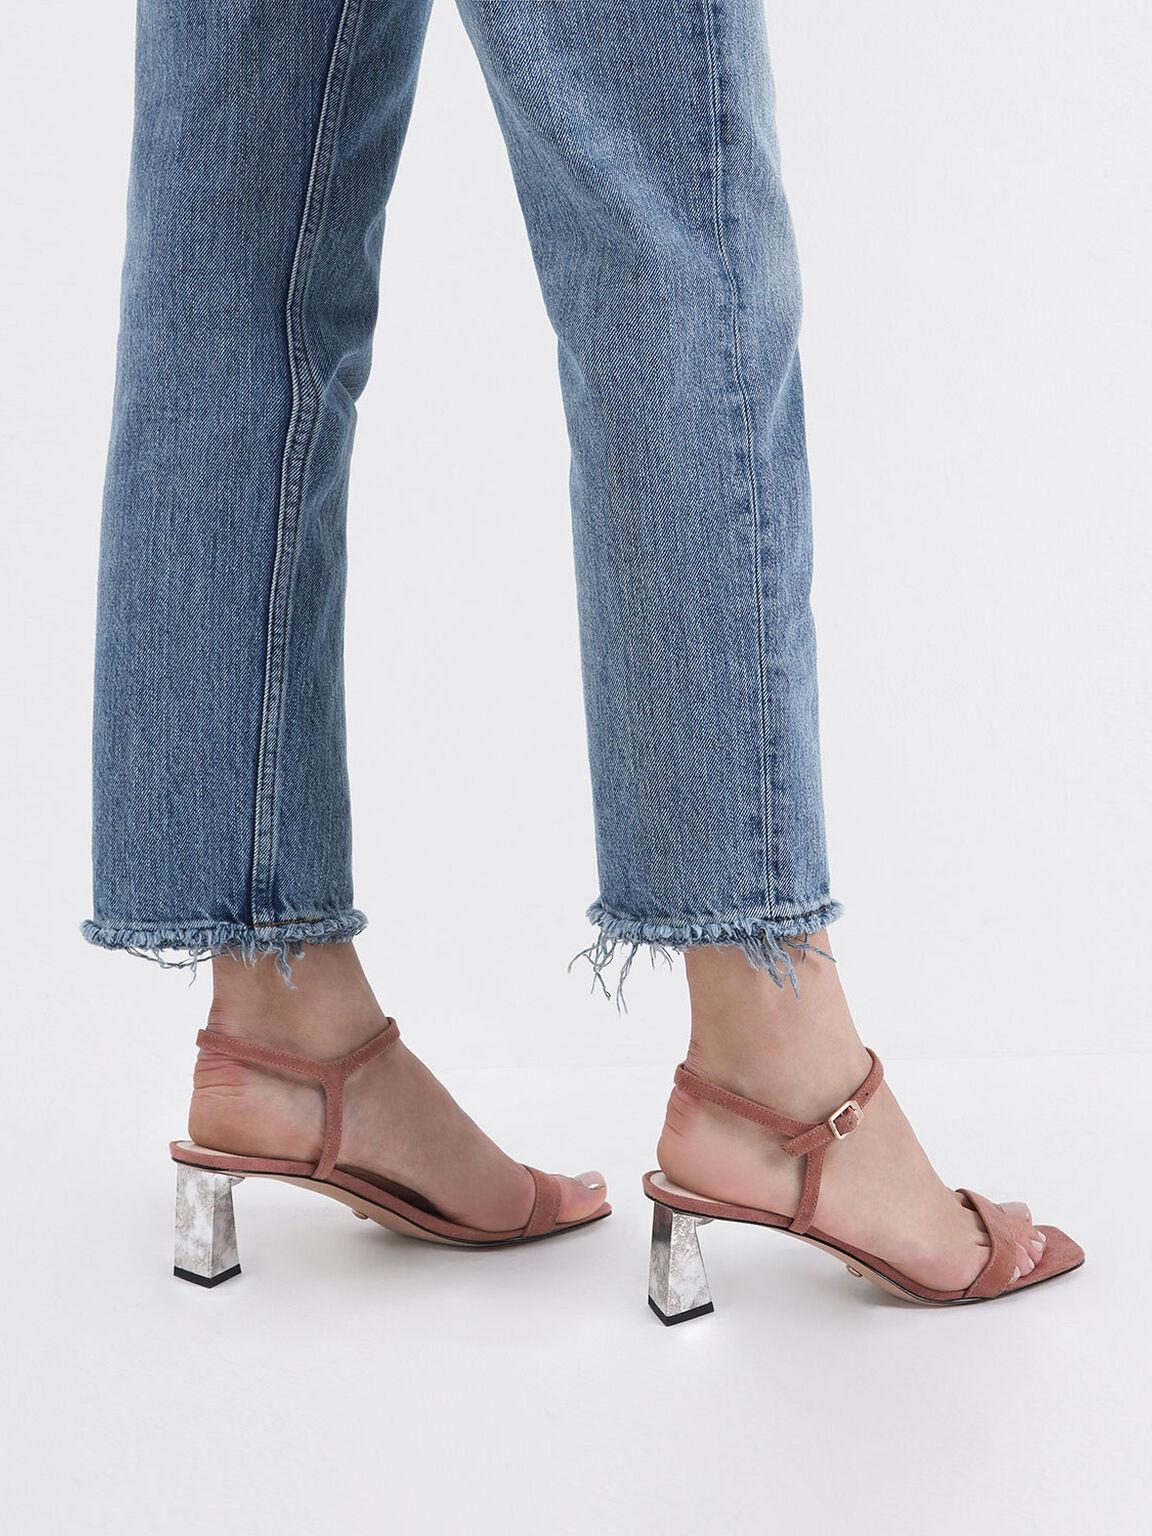 Kid Suede Chrome Heel Sandals, Brick, hi-res